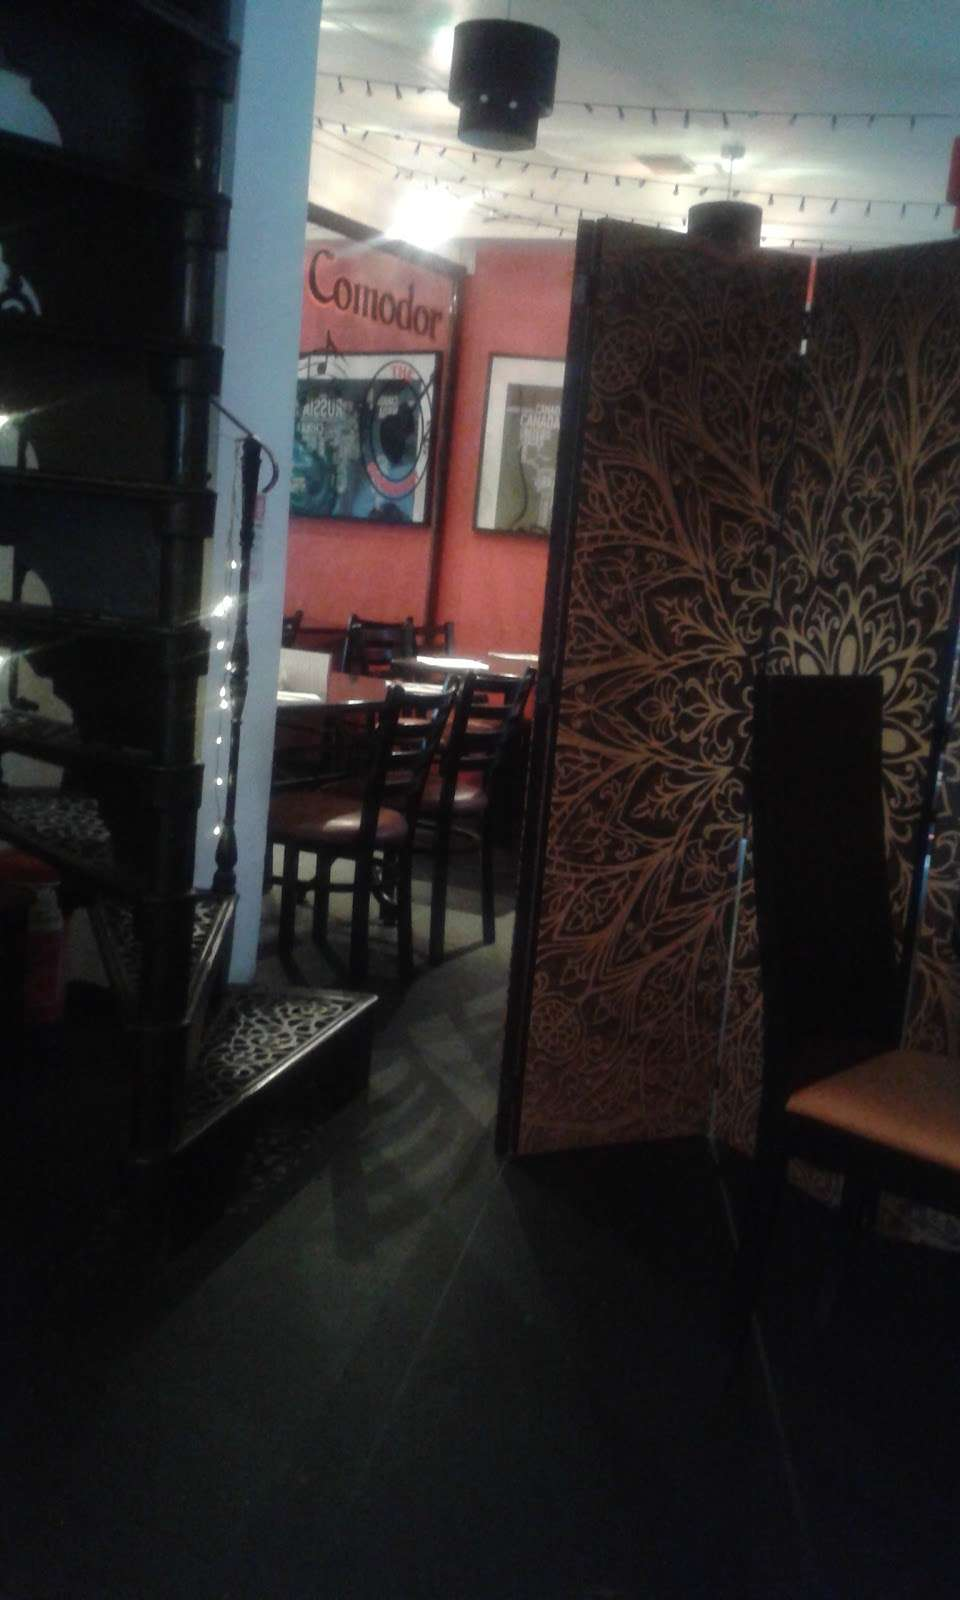 Pizza Comodor - restaurant  | Photo 5 of 6 | Address: 1 Market Square, Westerham TN16 1AN, UK | Phone: 01959 565600